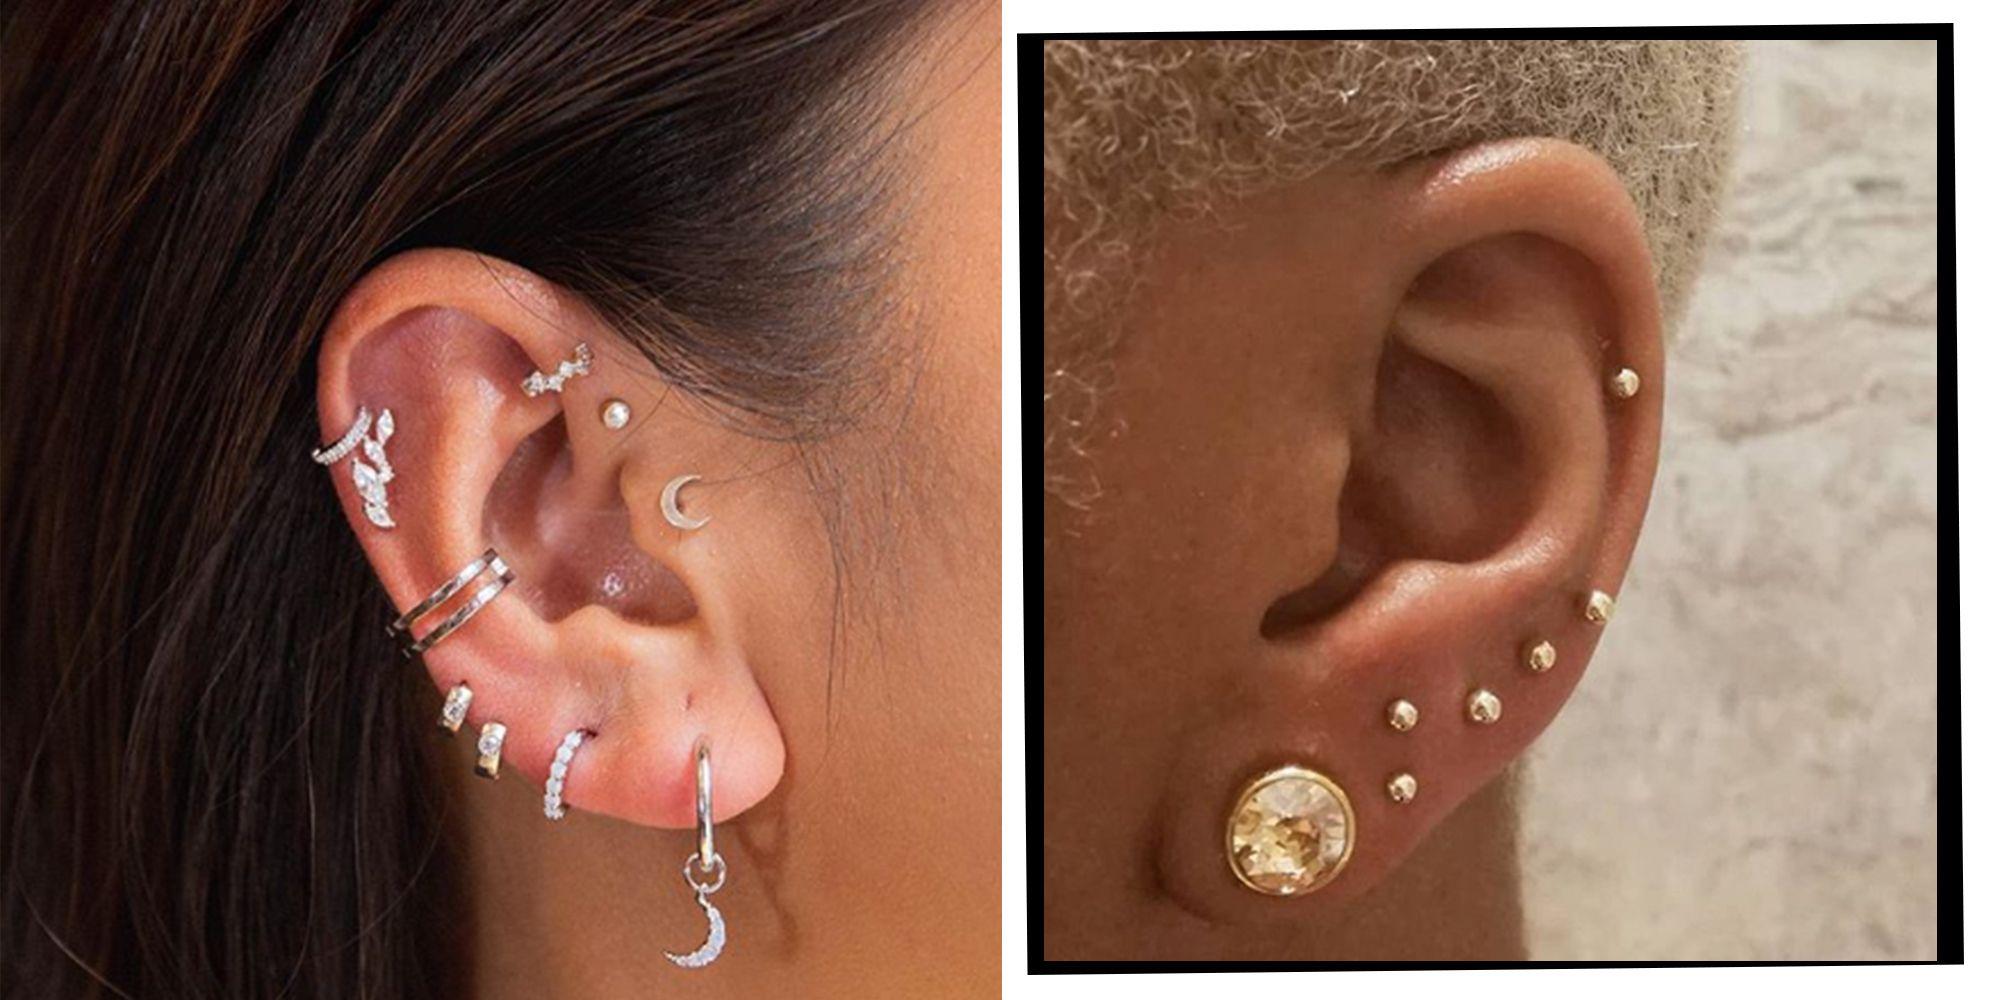 Ear Piercings Multiple Ear Piercings Inspiration For Curating